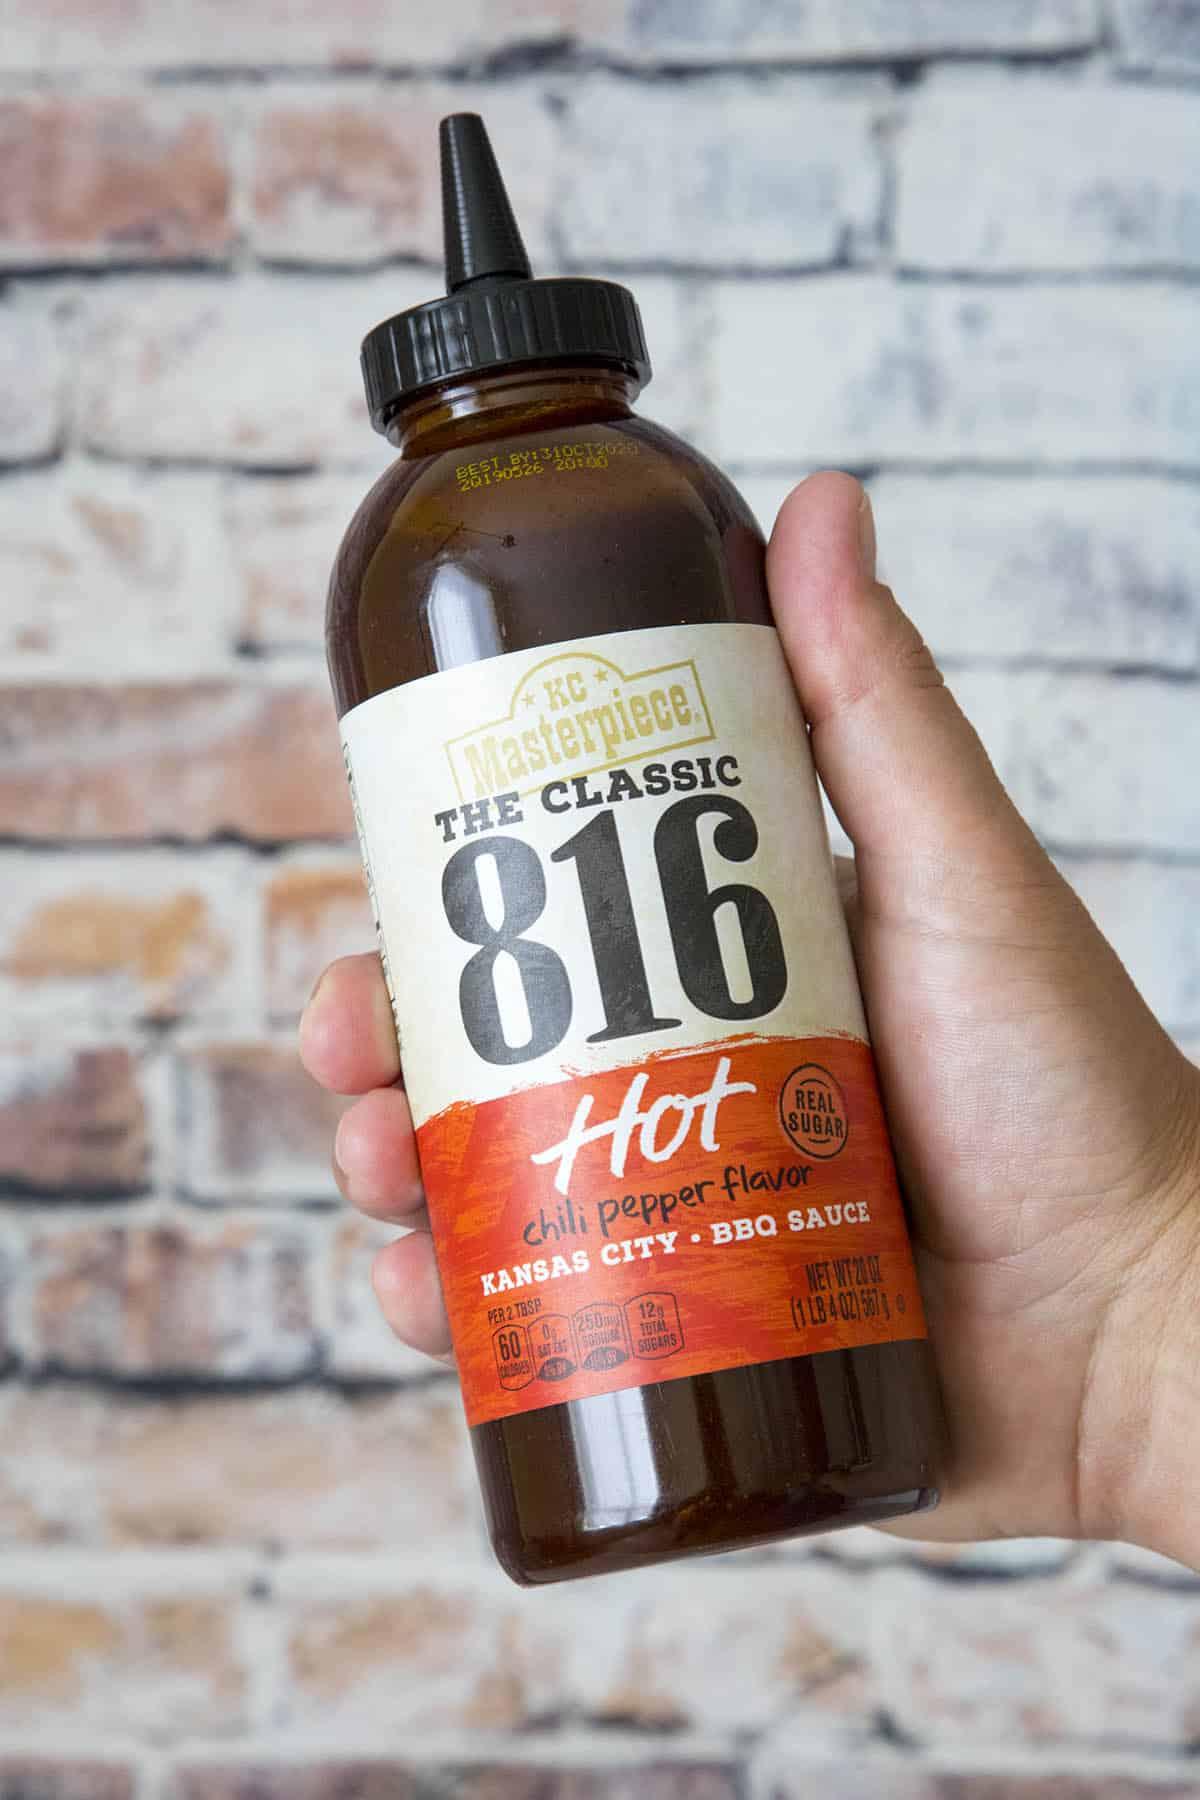 KC Masterpiece® 816 Hot BBQ Sauce